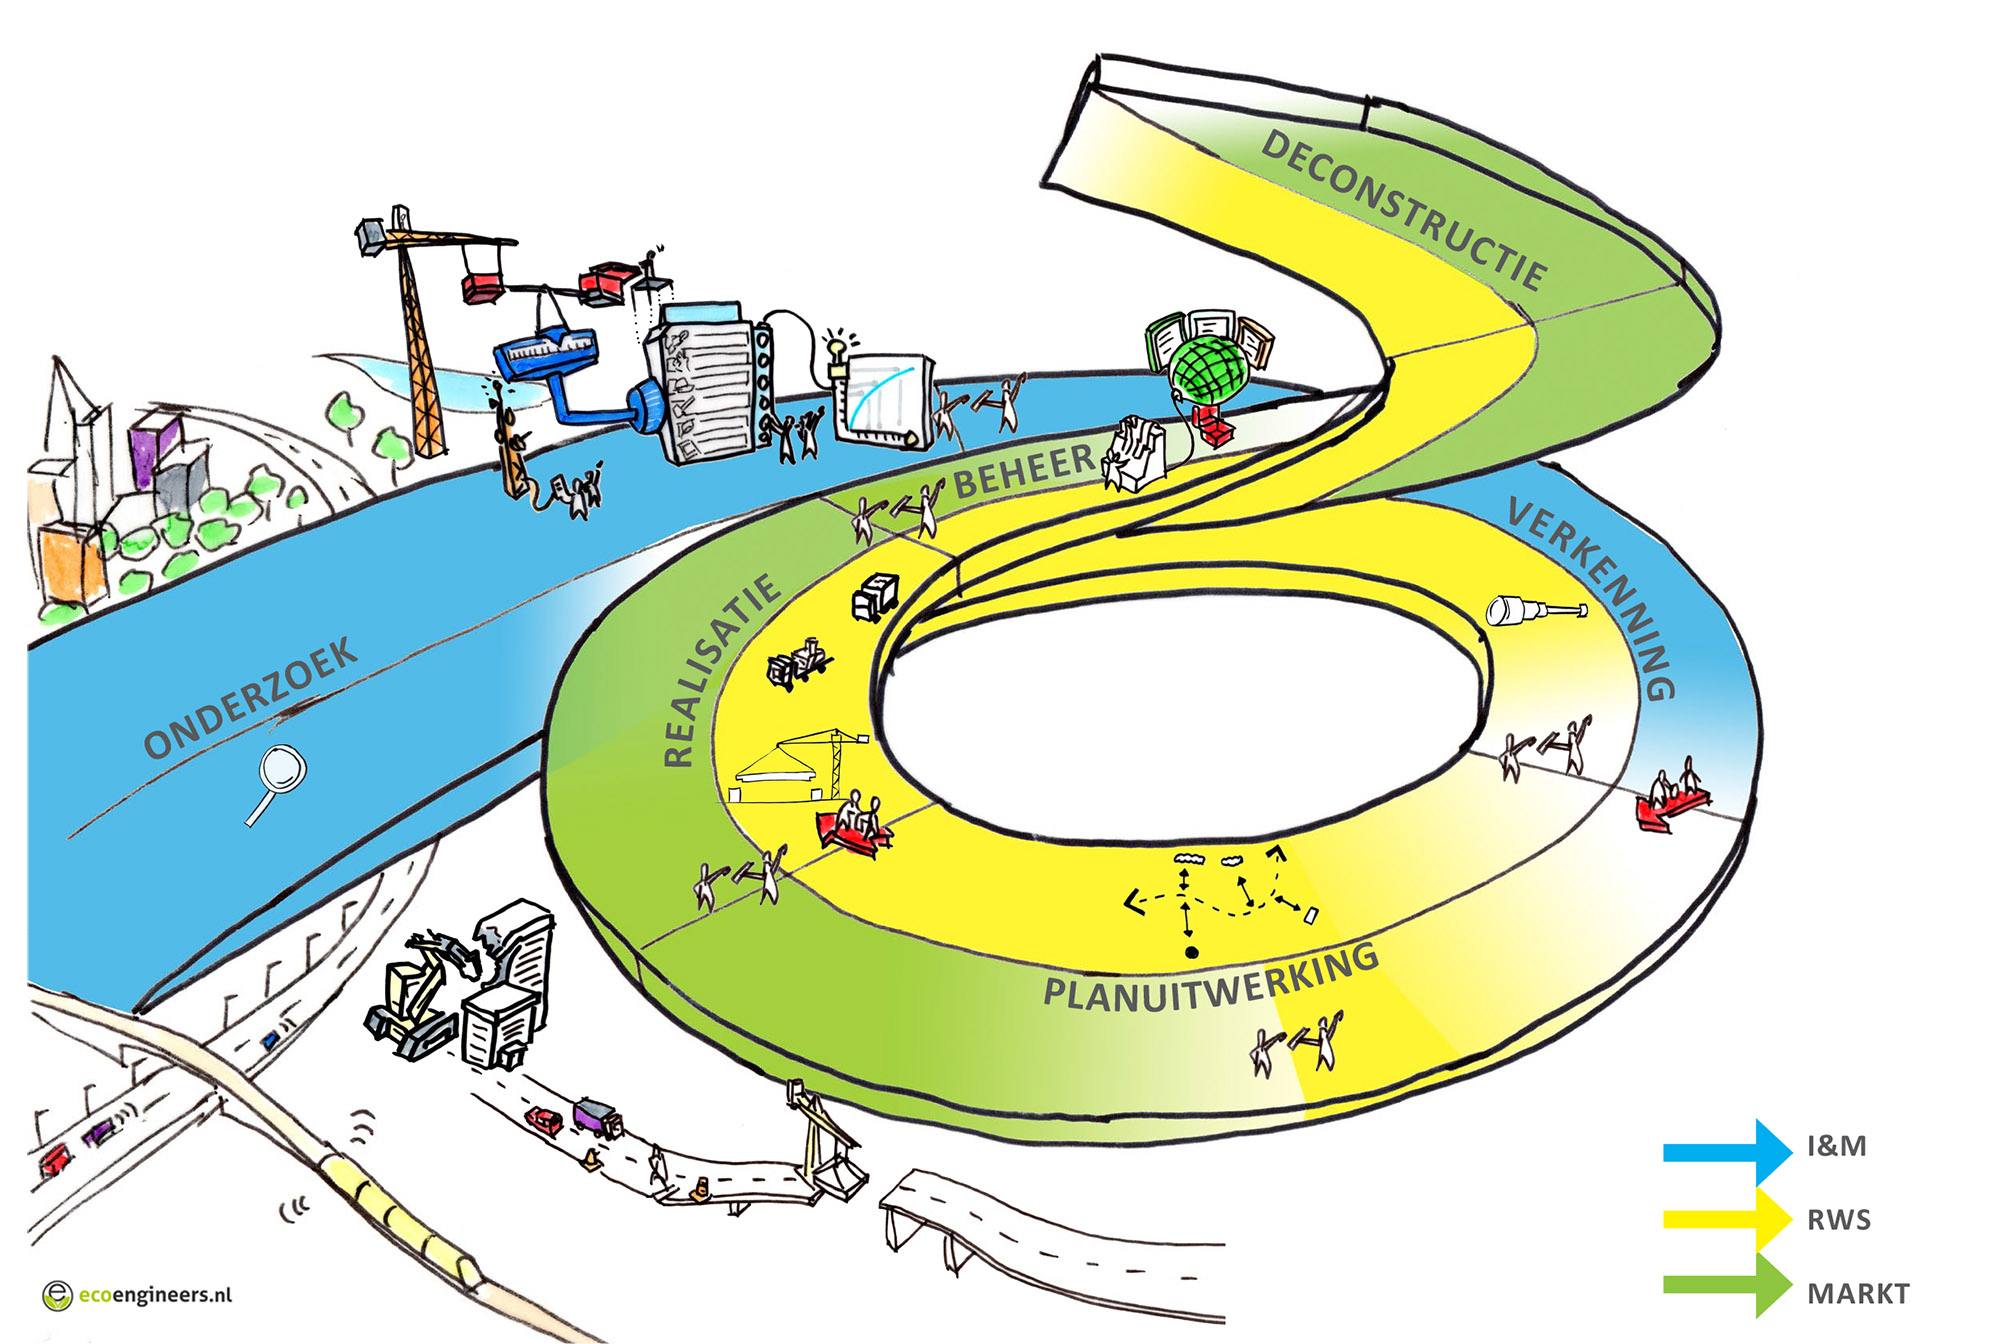 Circulair Ontwerpen RWS MIRT en SLA circulair verbonden keten